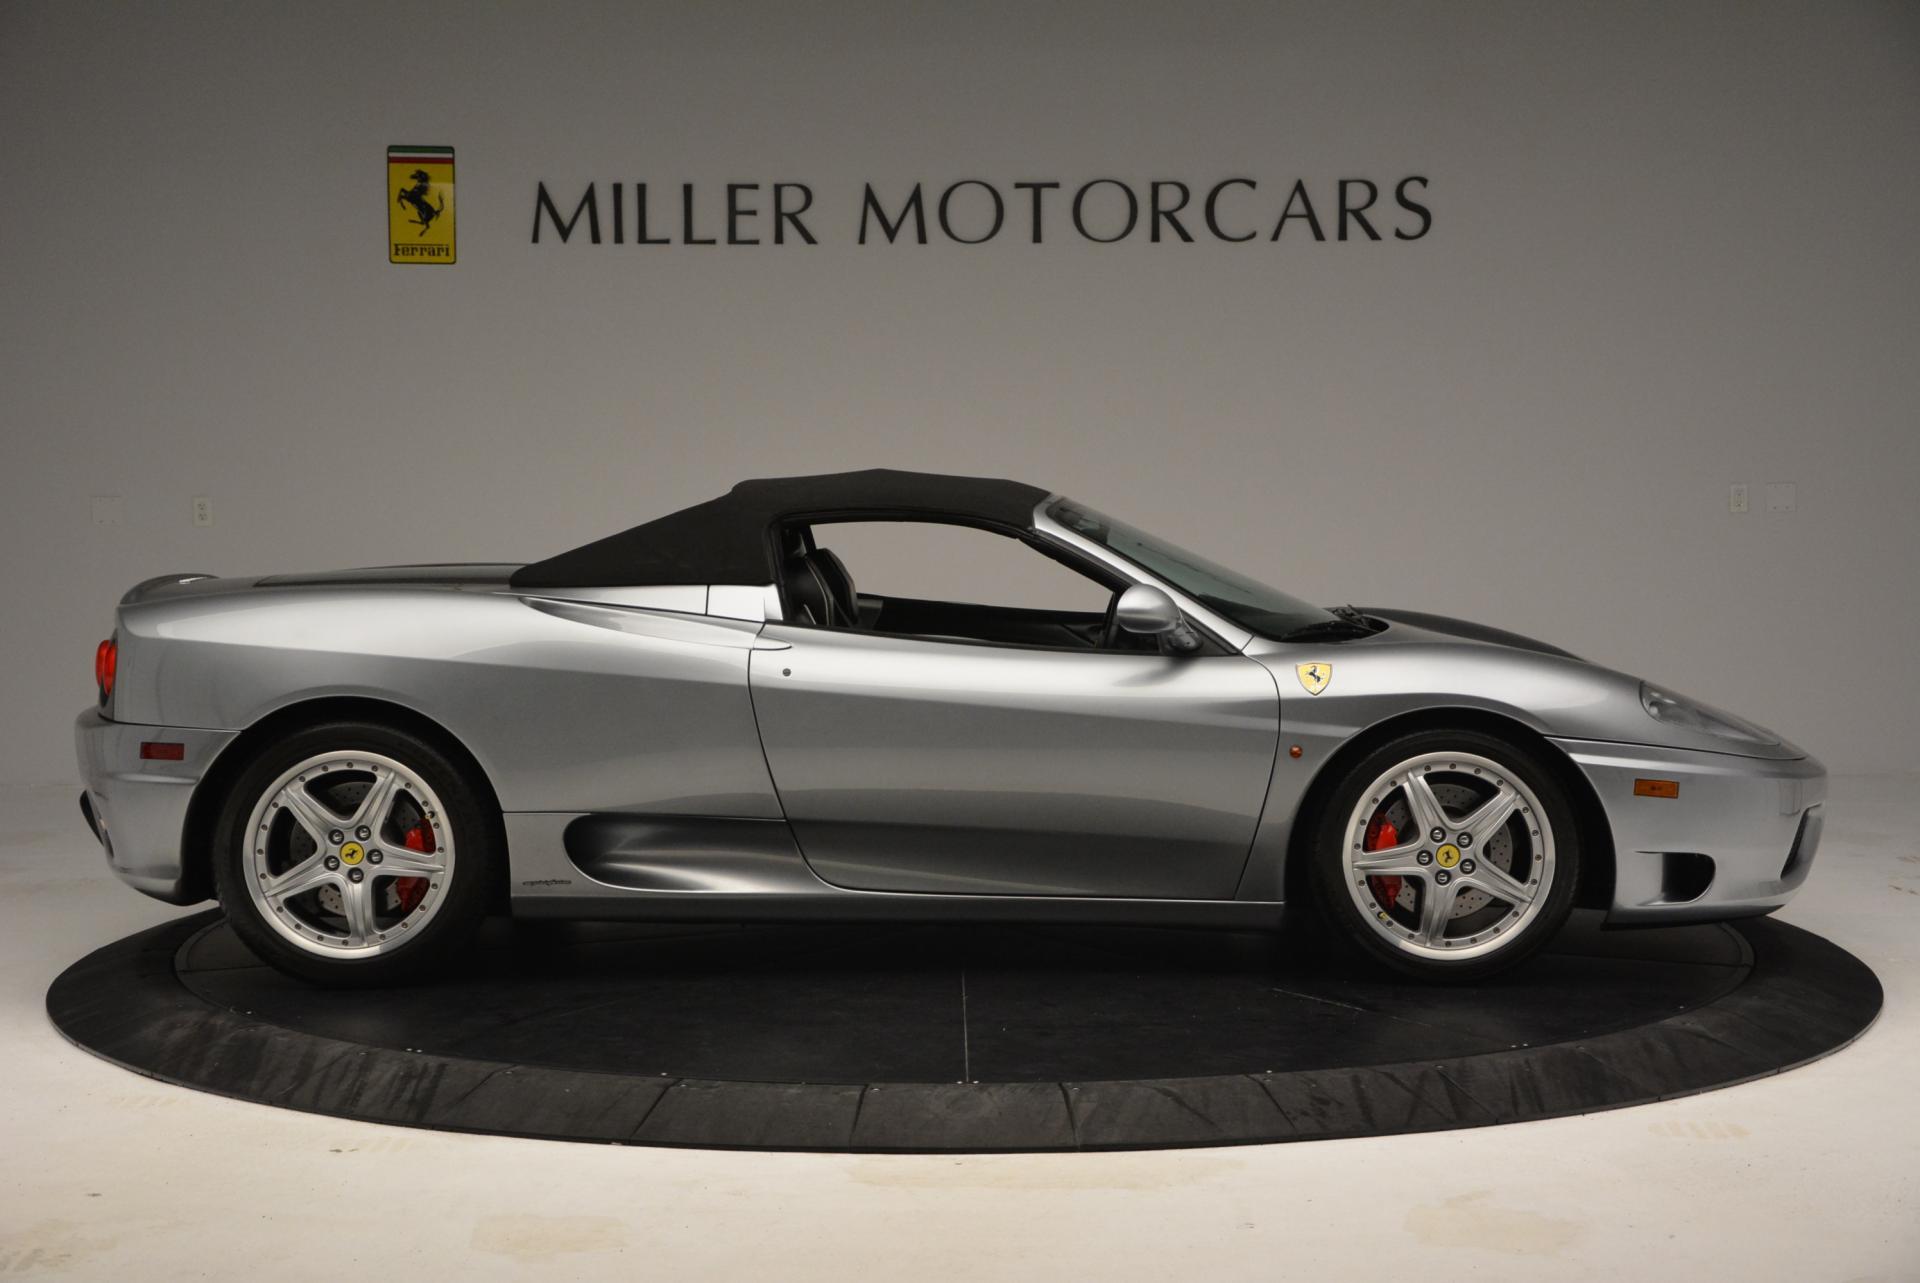 Used 2004 Ferrari 360 Spider 6-Speed Manual  For Sale In Greenwich, CT. Alfa Romeo of Greenwich, 4317 138_p21